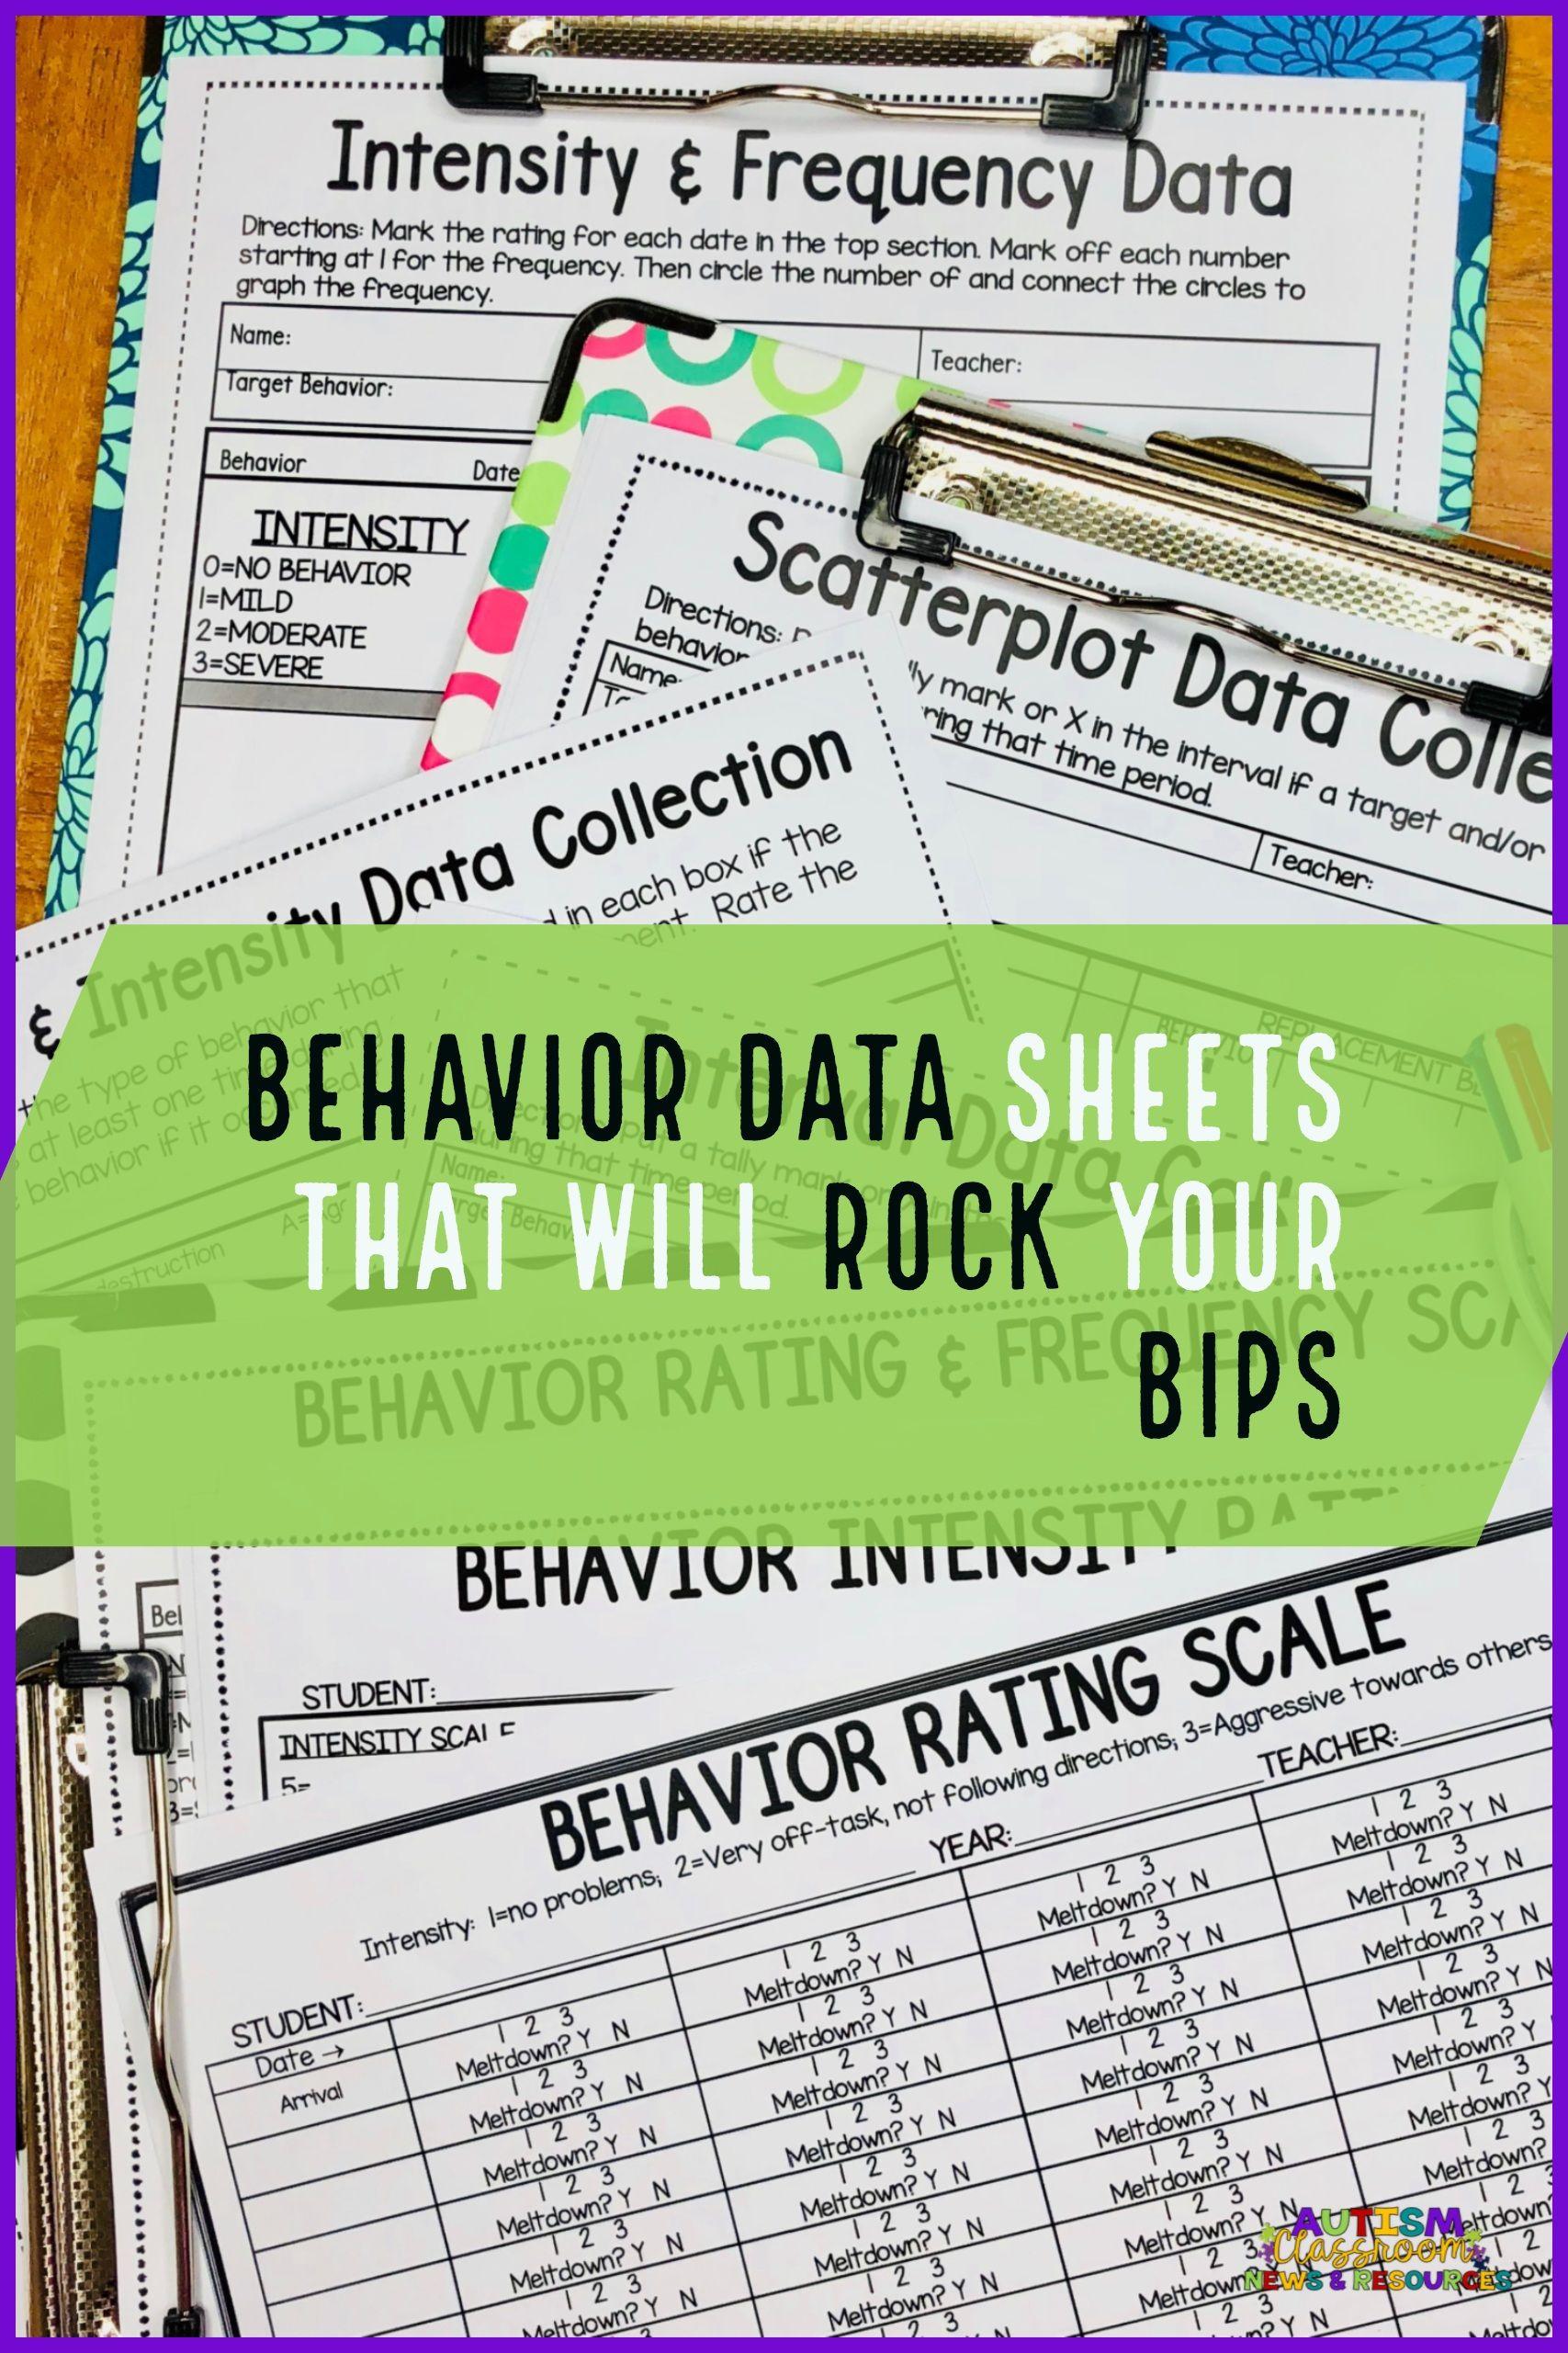 Behavior Data Sheets That Will Rock Your BIPs! | Special Edu Teacher ...